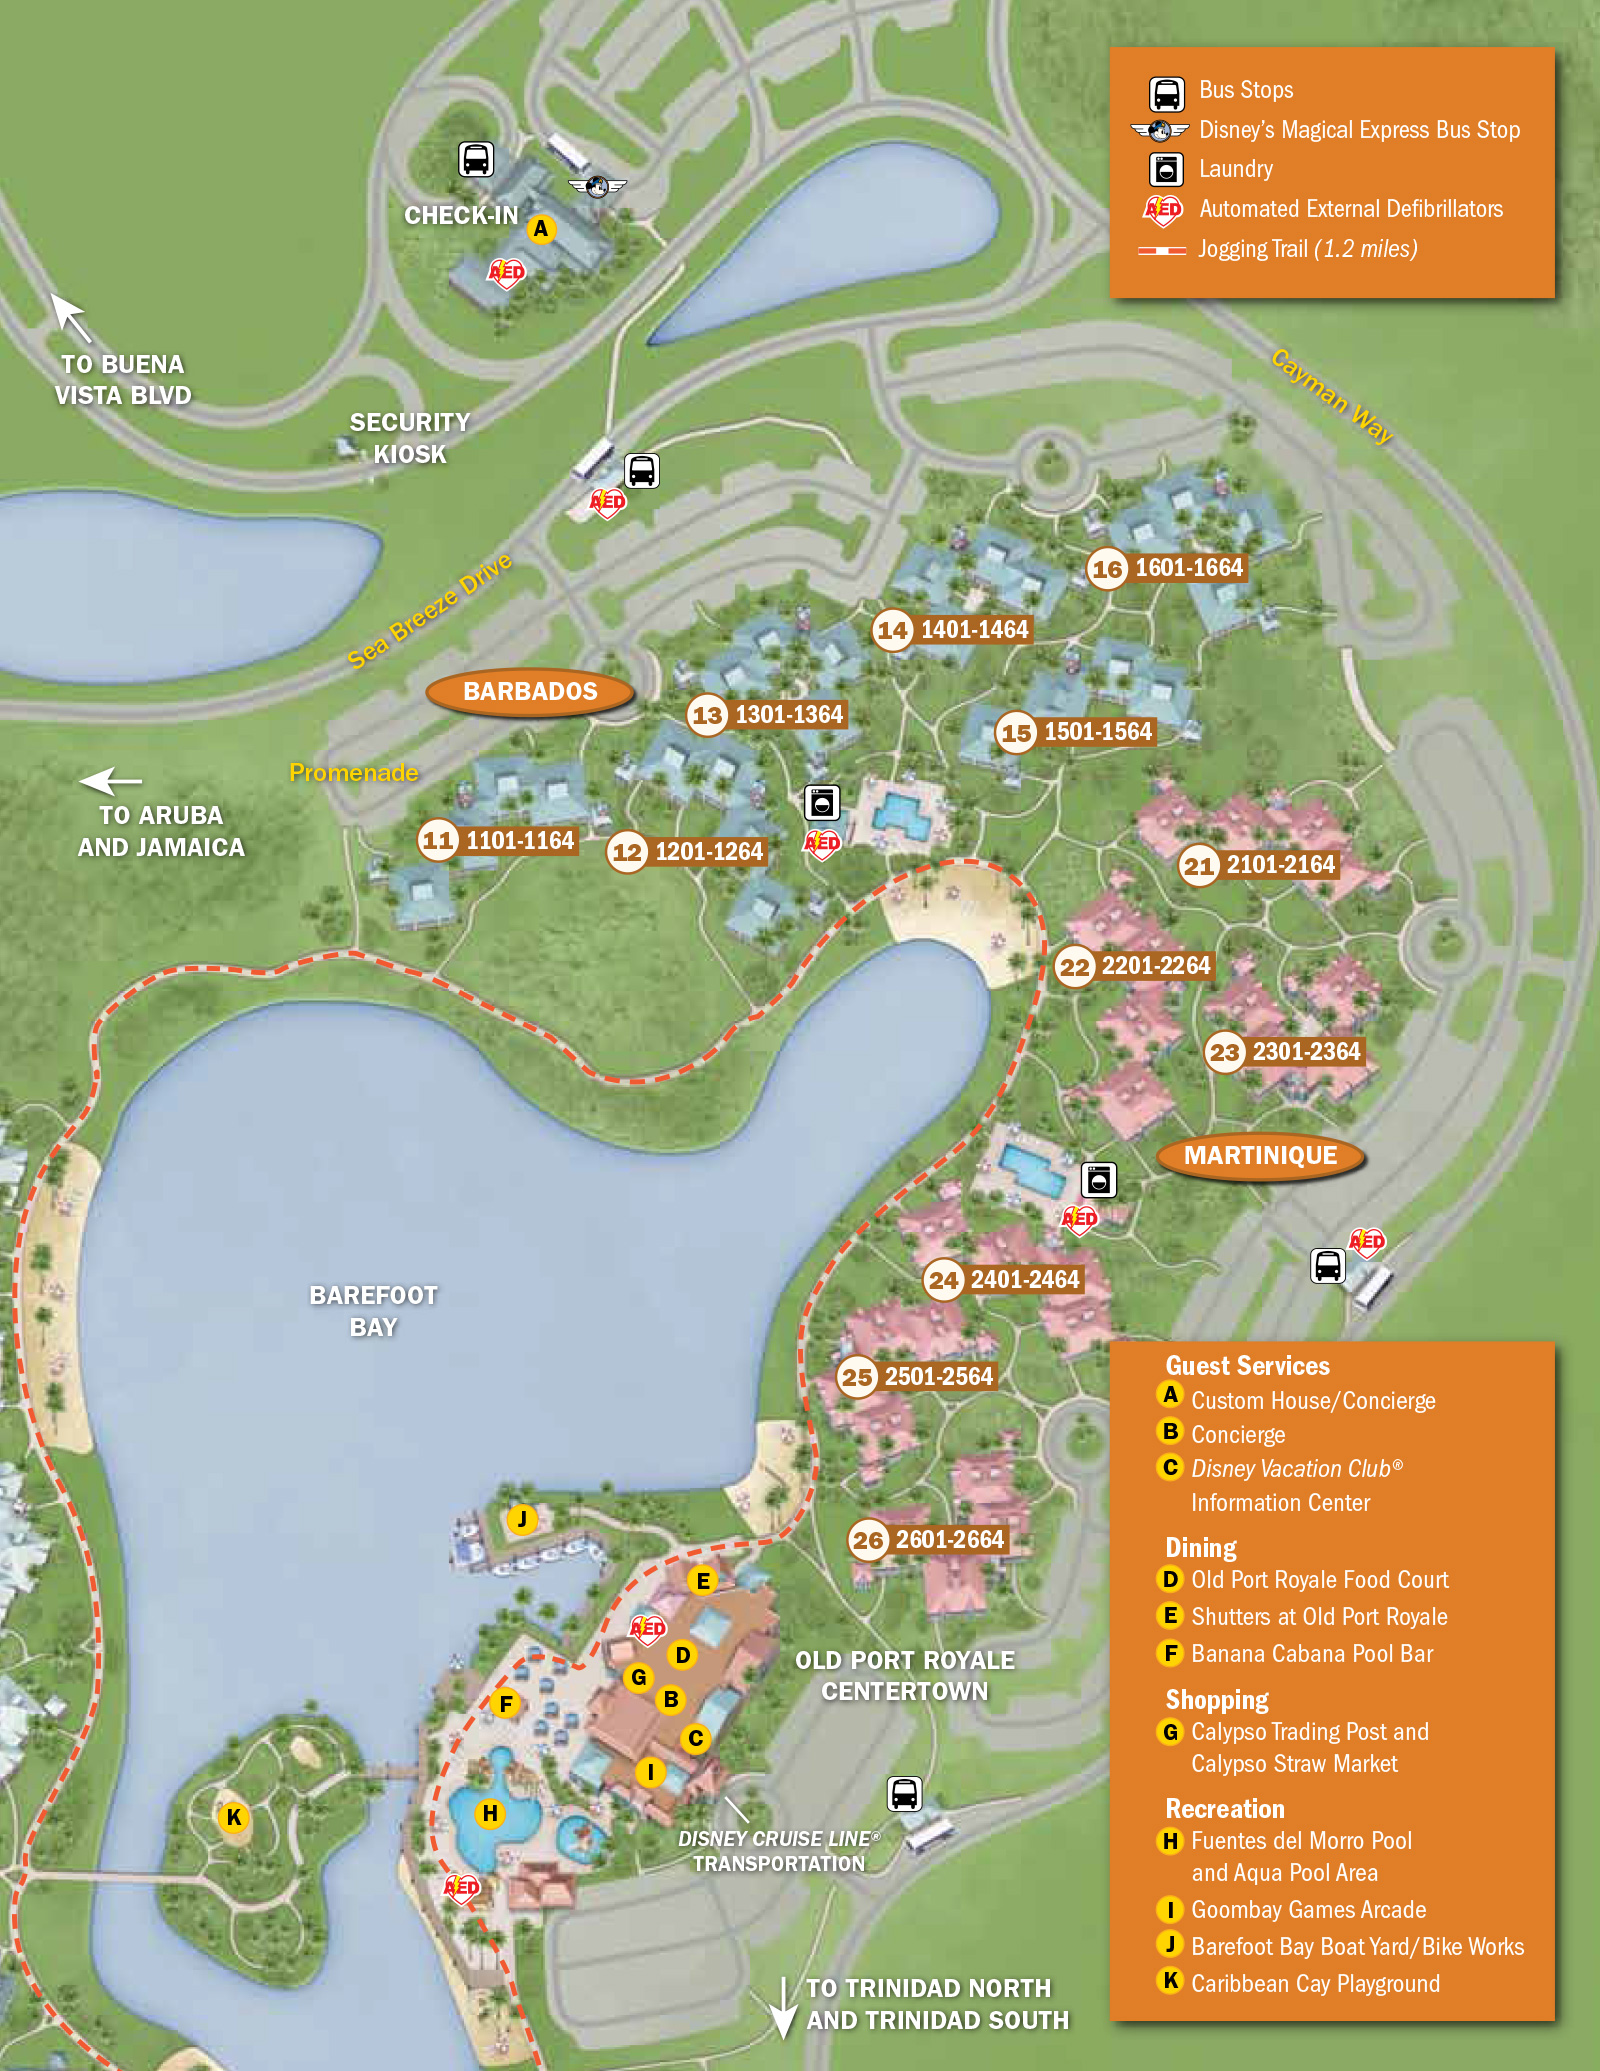 2013 Caribbean Beach Resort guide map - Photo 4 of 6